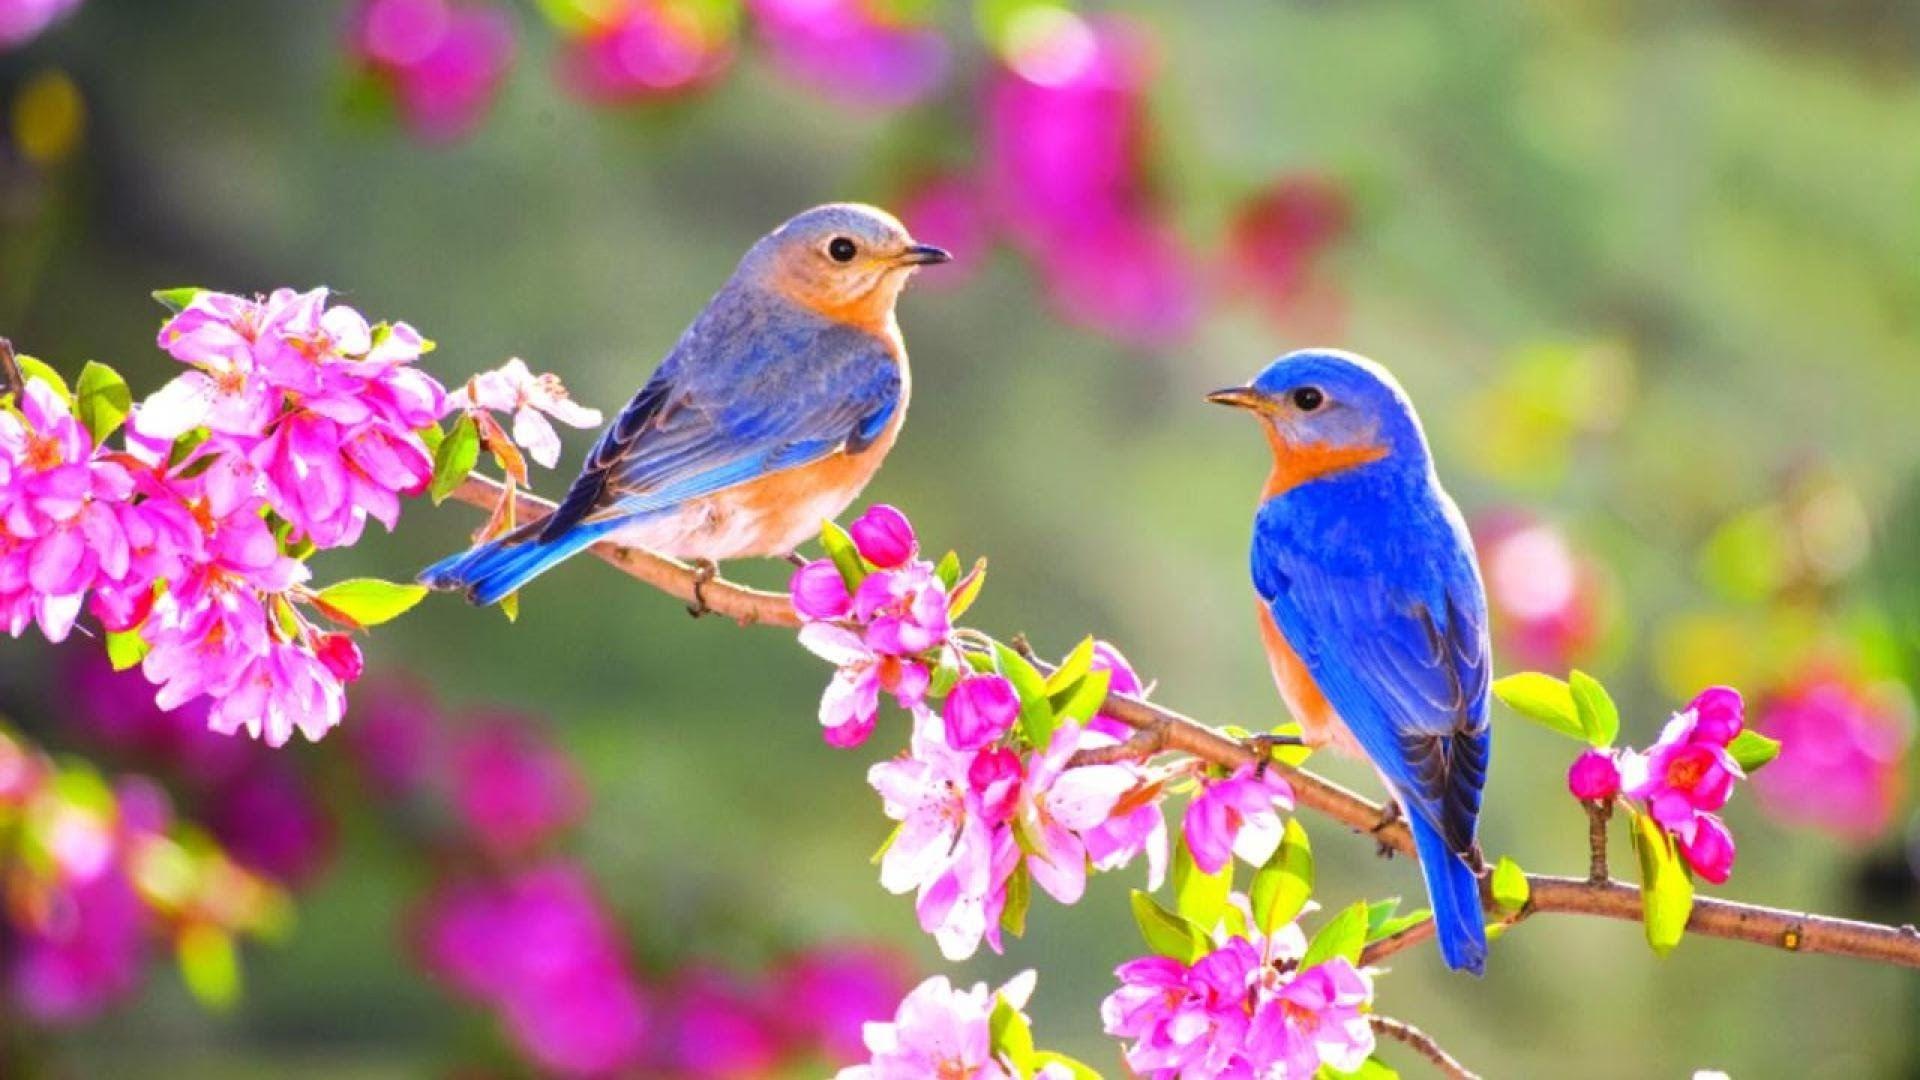 Обои на телефон птички